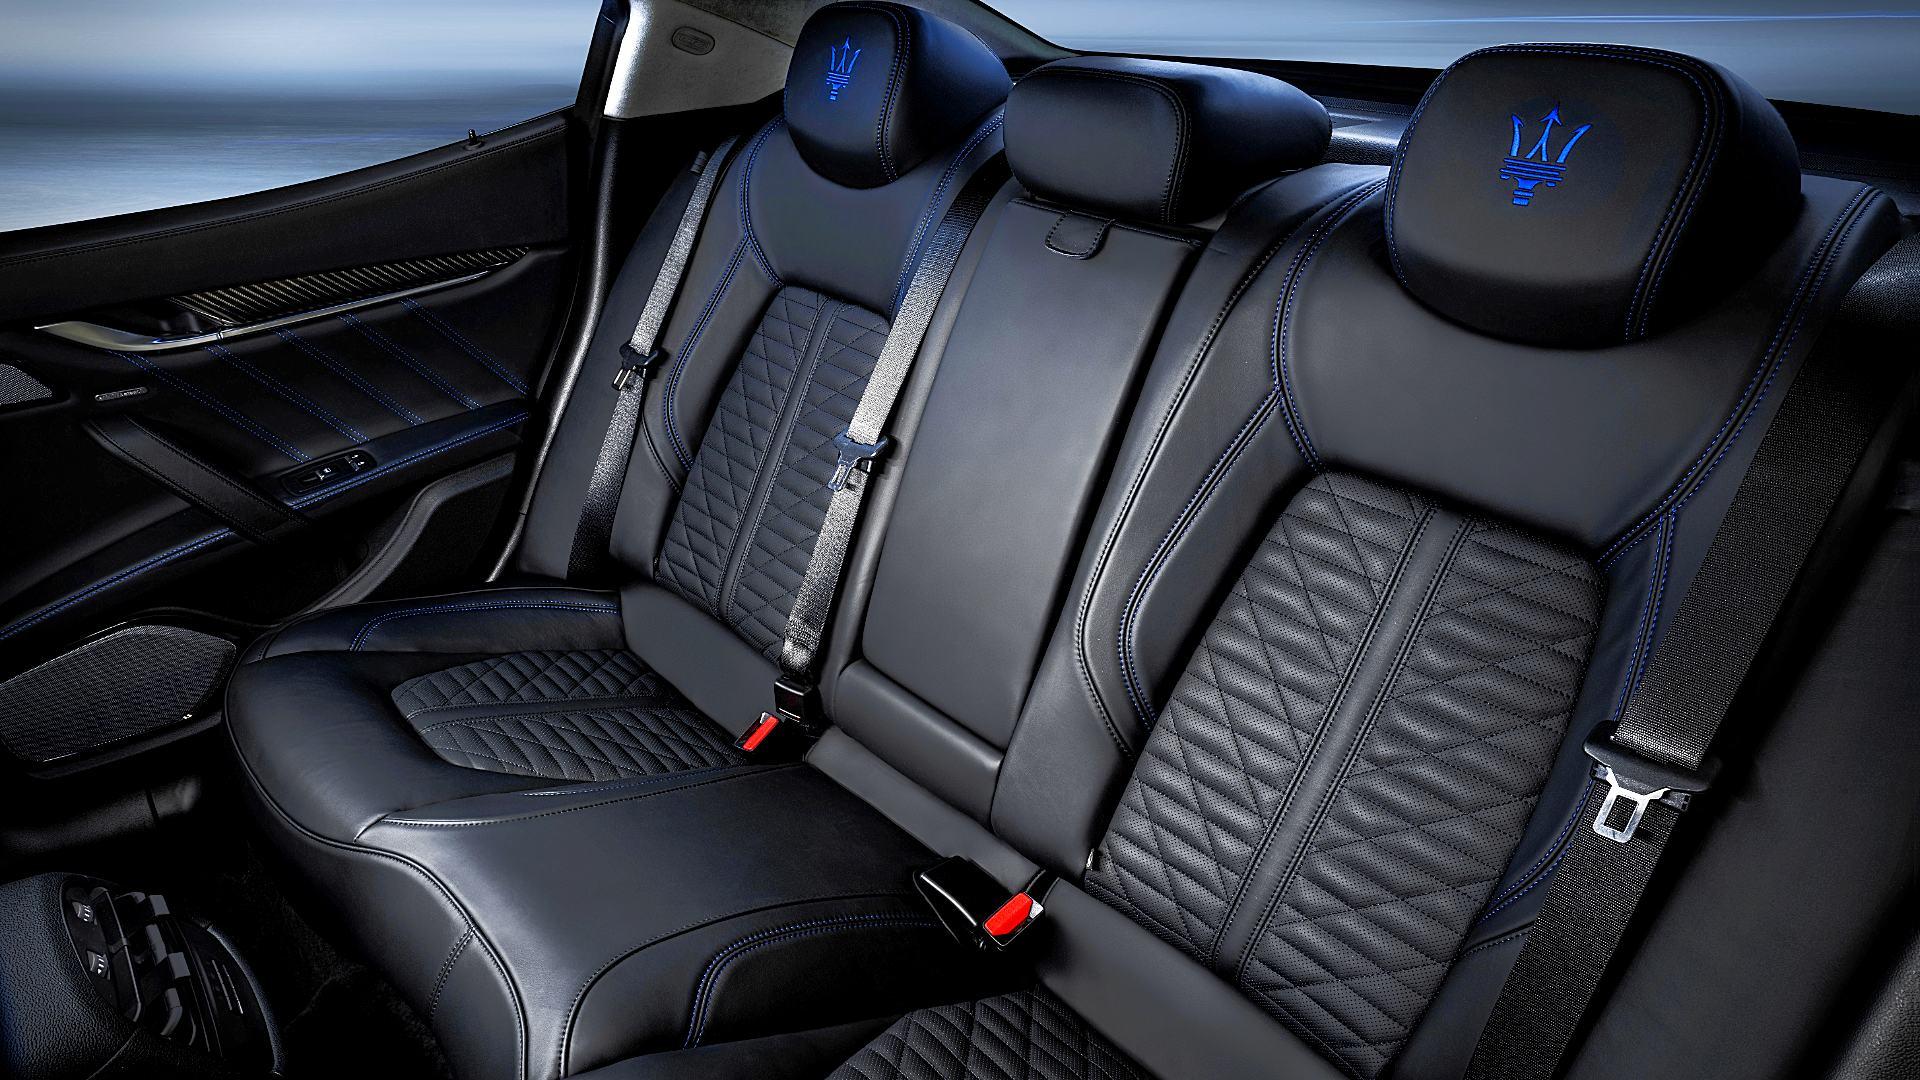 2021 Maserati Ghibli Hybrid Interior Images